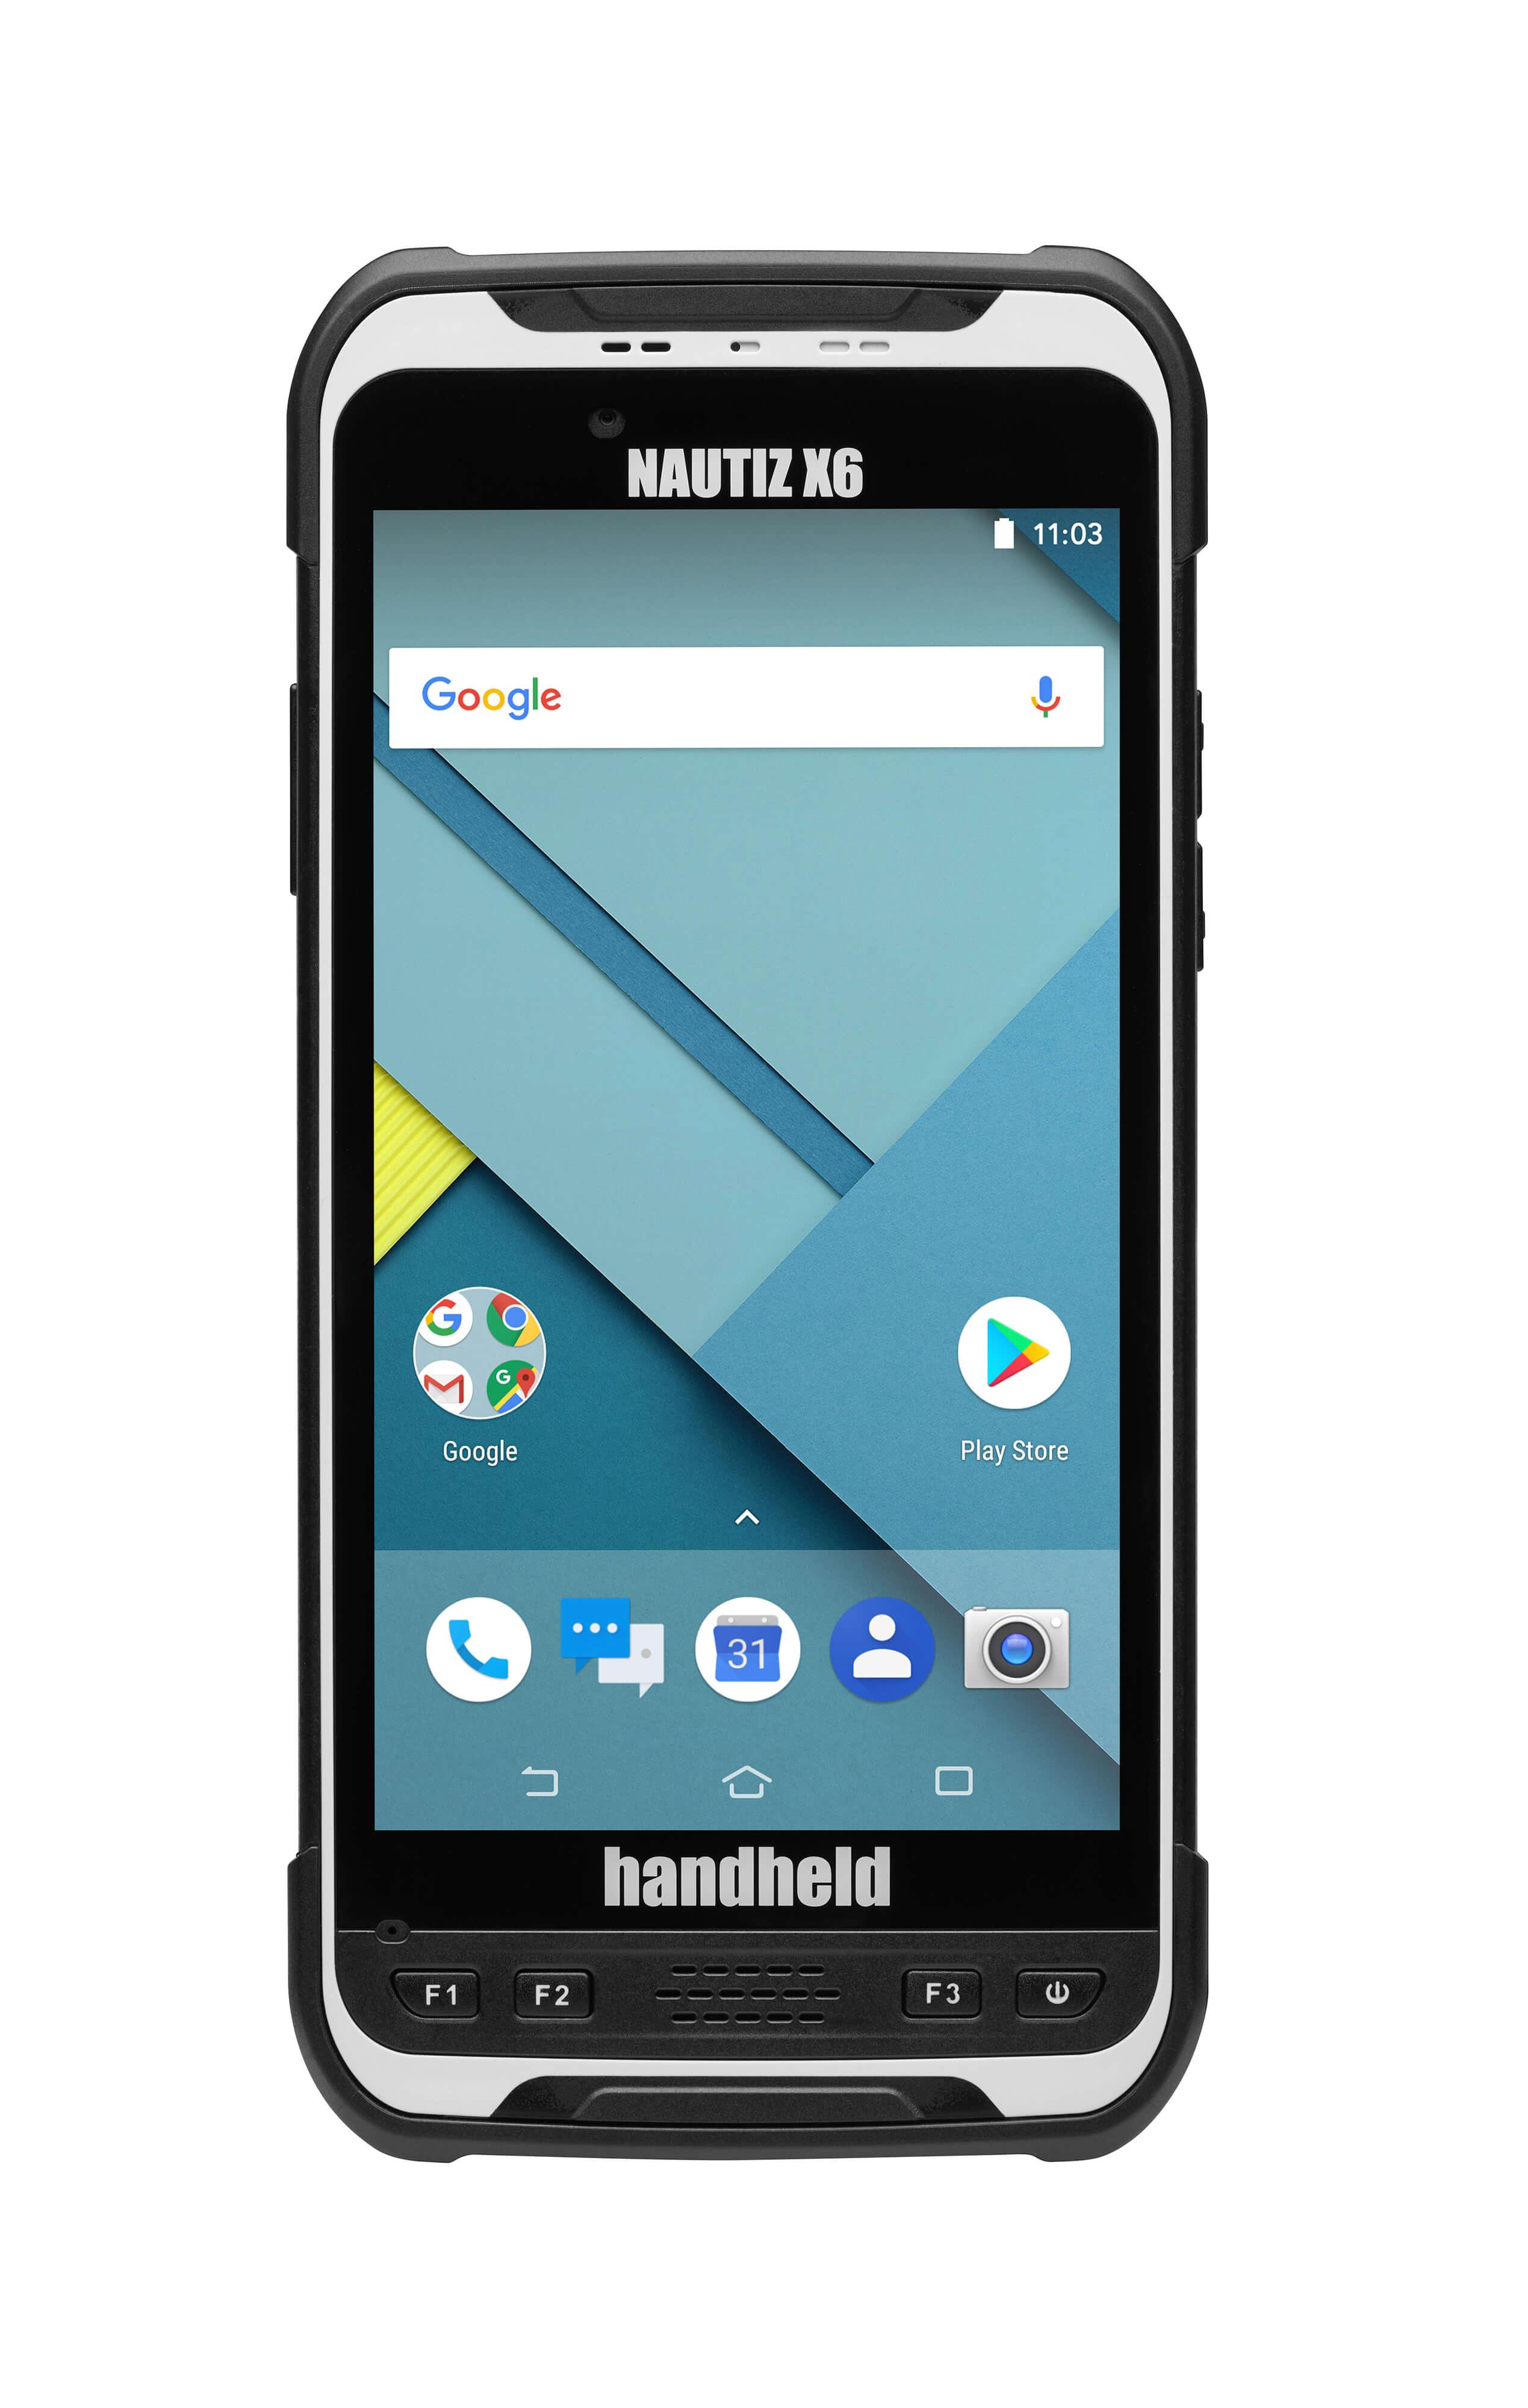 Nautiz-X6-handheld-phablet-facing-front